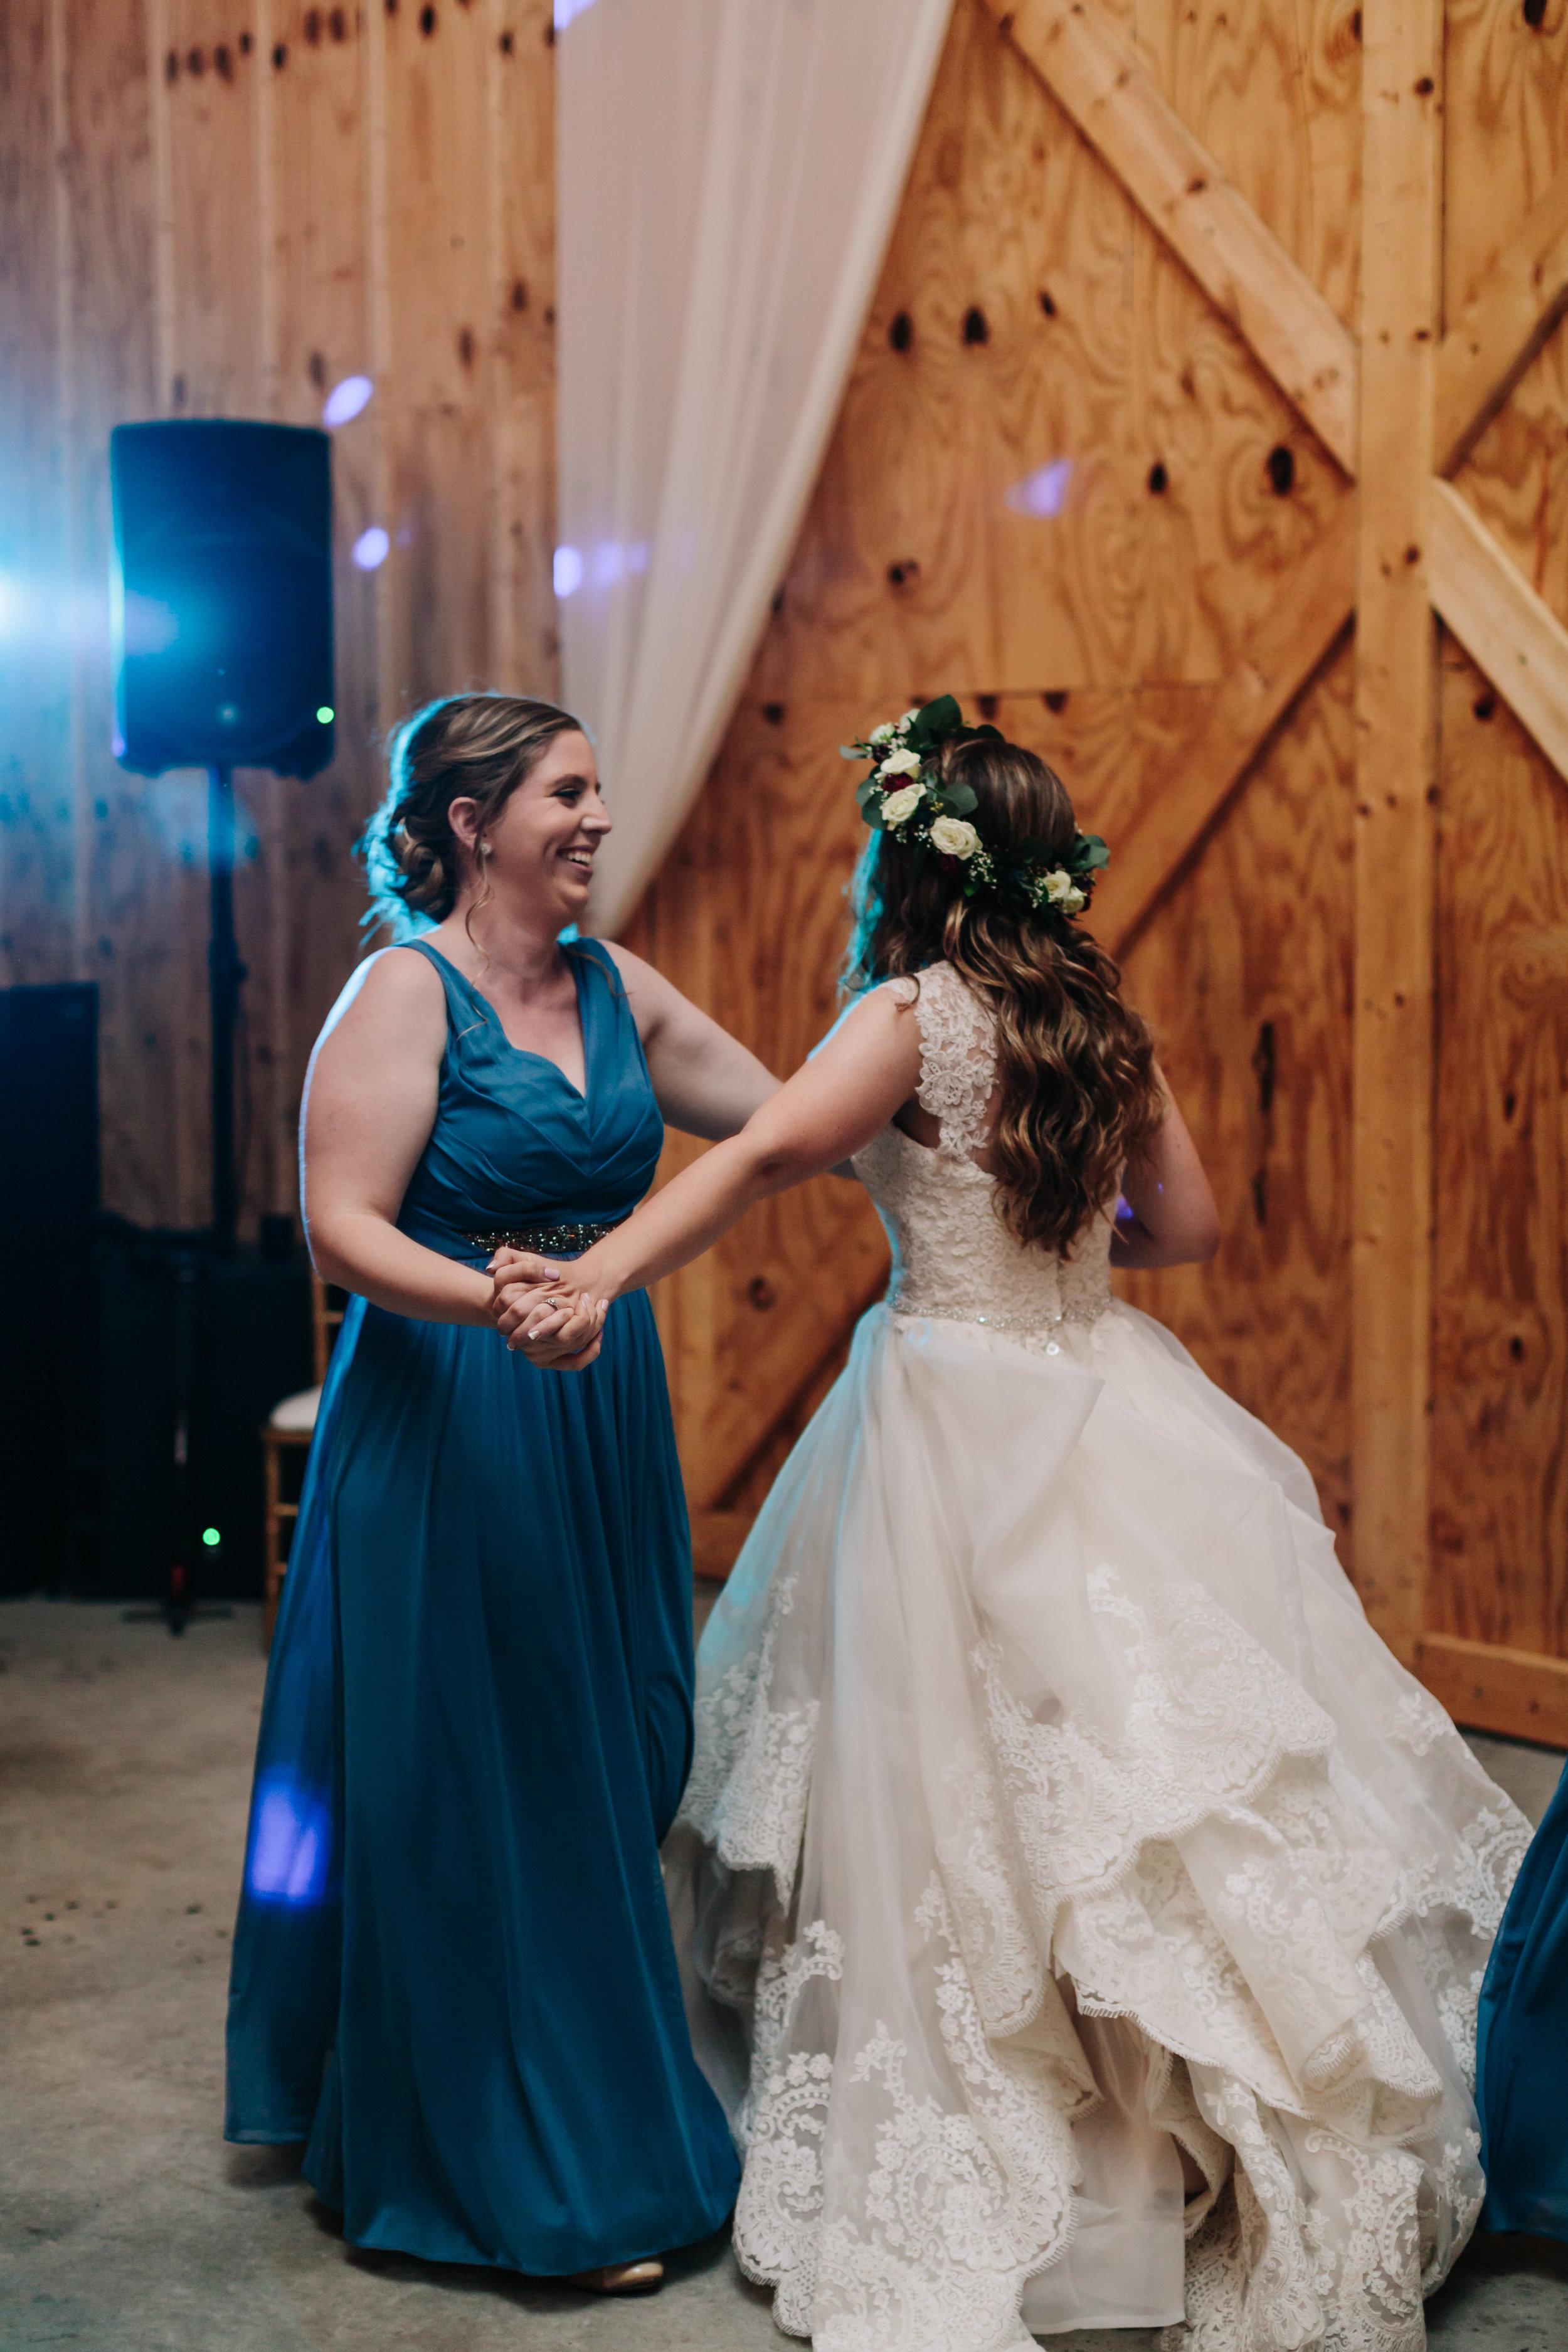 2018.04.14 Zak and Jamisyn Unrue Black Willow Barn Wedding Finals-750.jpg